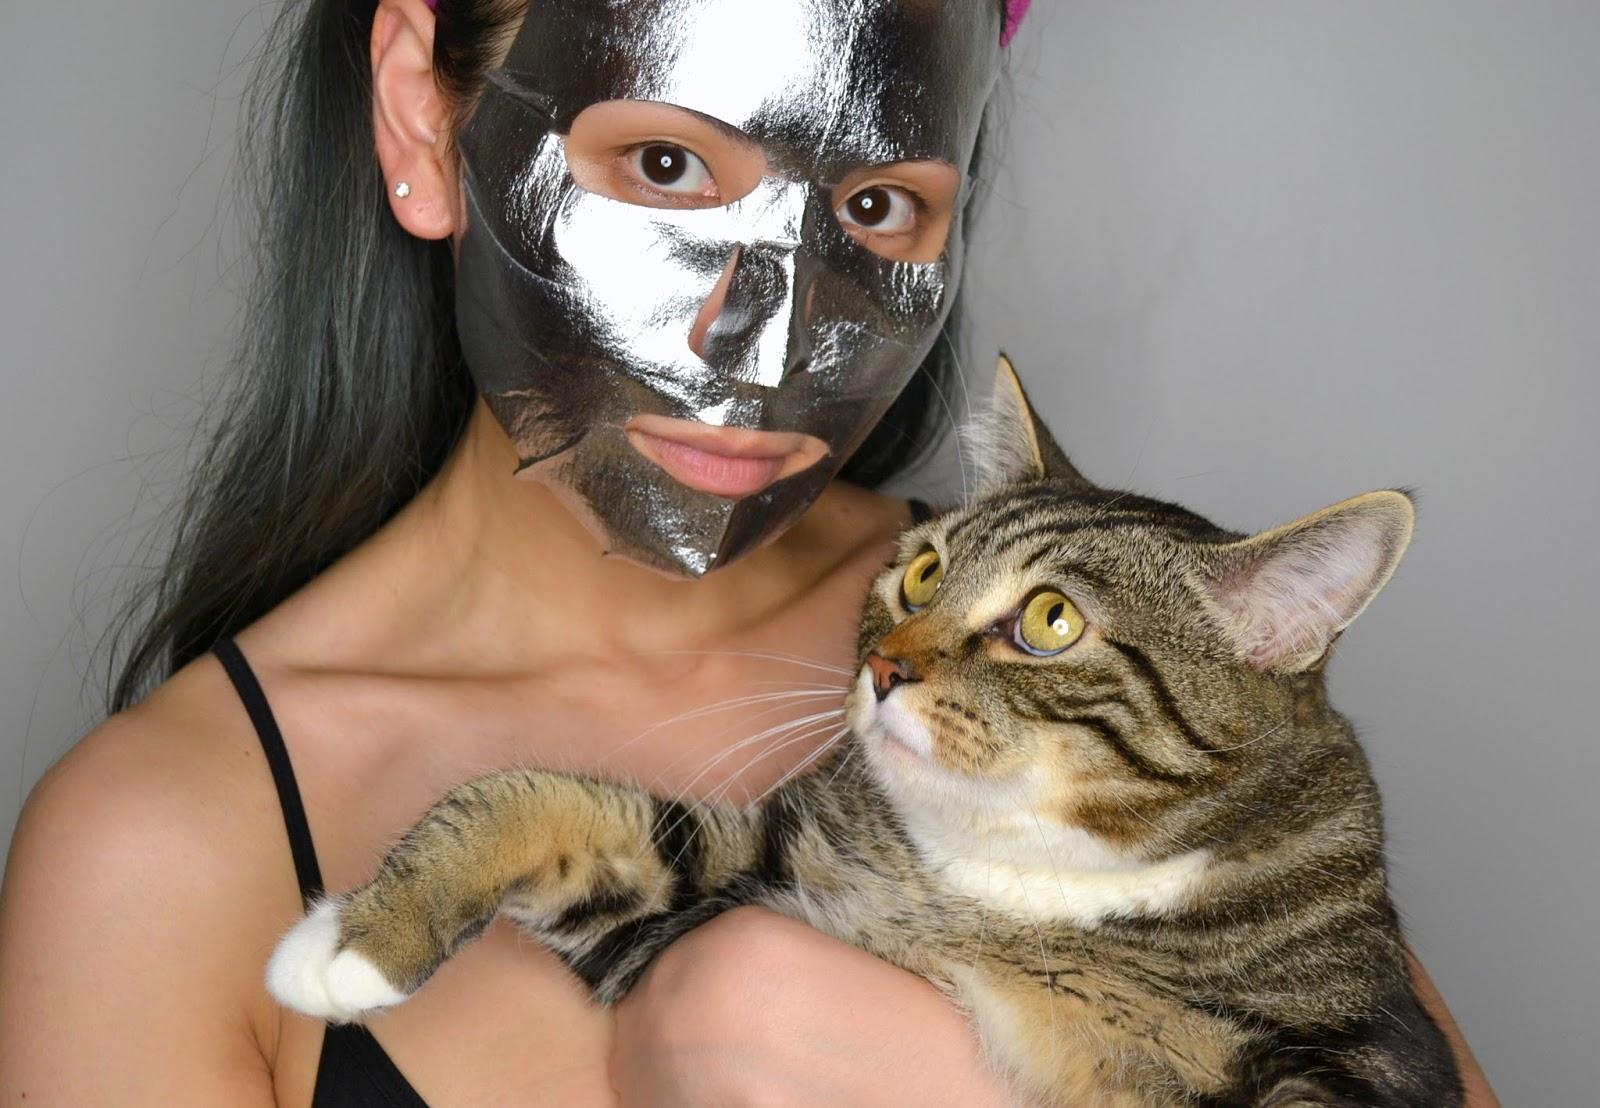 SKINCARE | The Face Shop Mask.Lab Anti-Aging Foil Face Mask ...